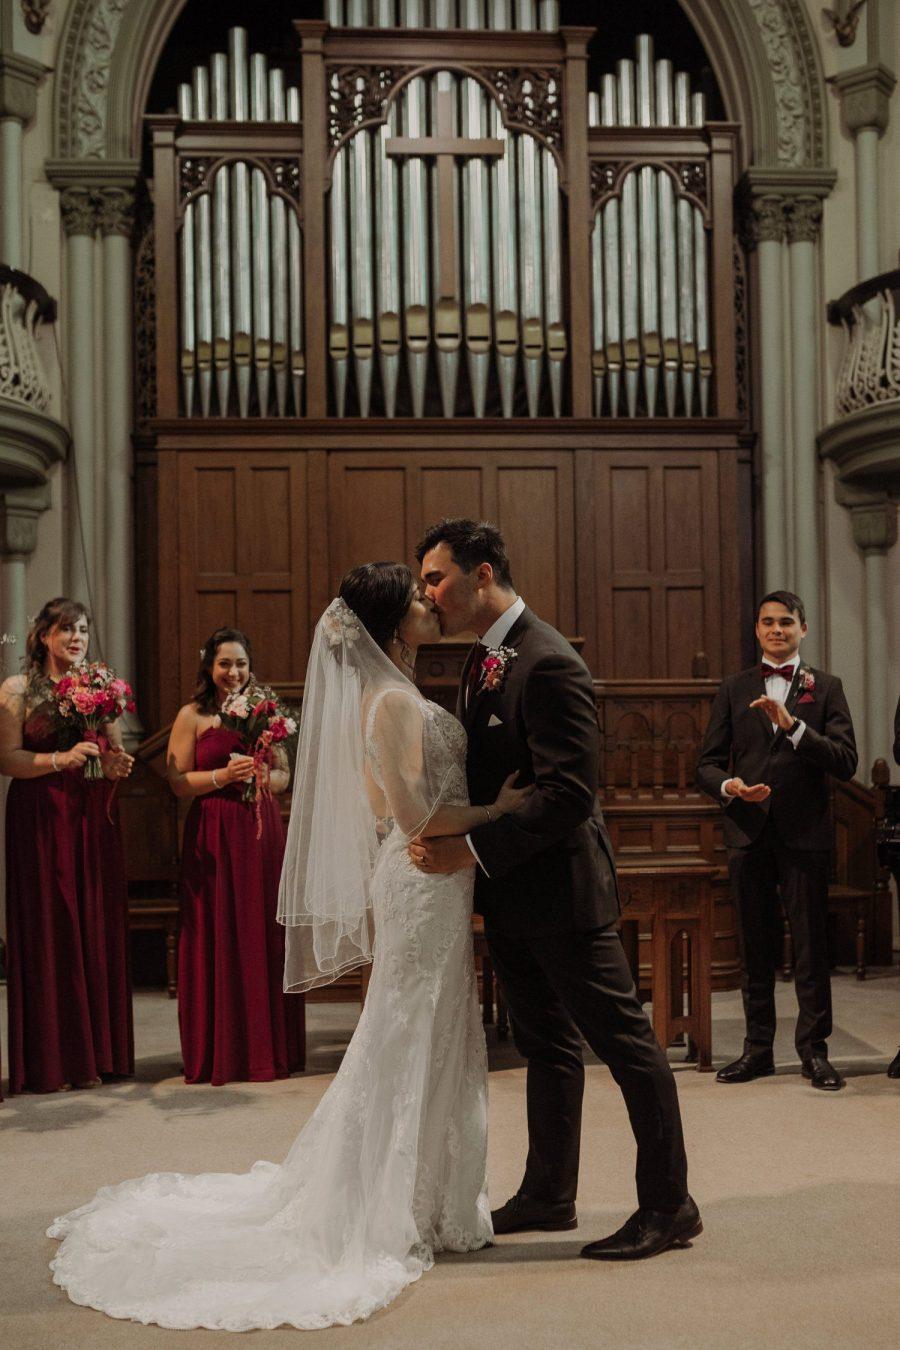 Ebony Blush Photography   Perth Wedding Photographer   Photography + Film   Sandalford Winery   Como Treasury Wedding   Perth City Wedding  Alex + Mel49